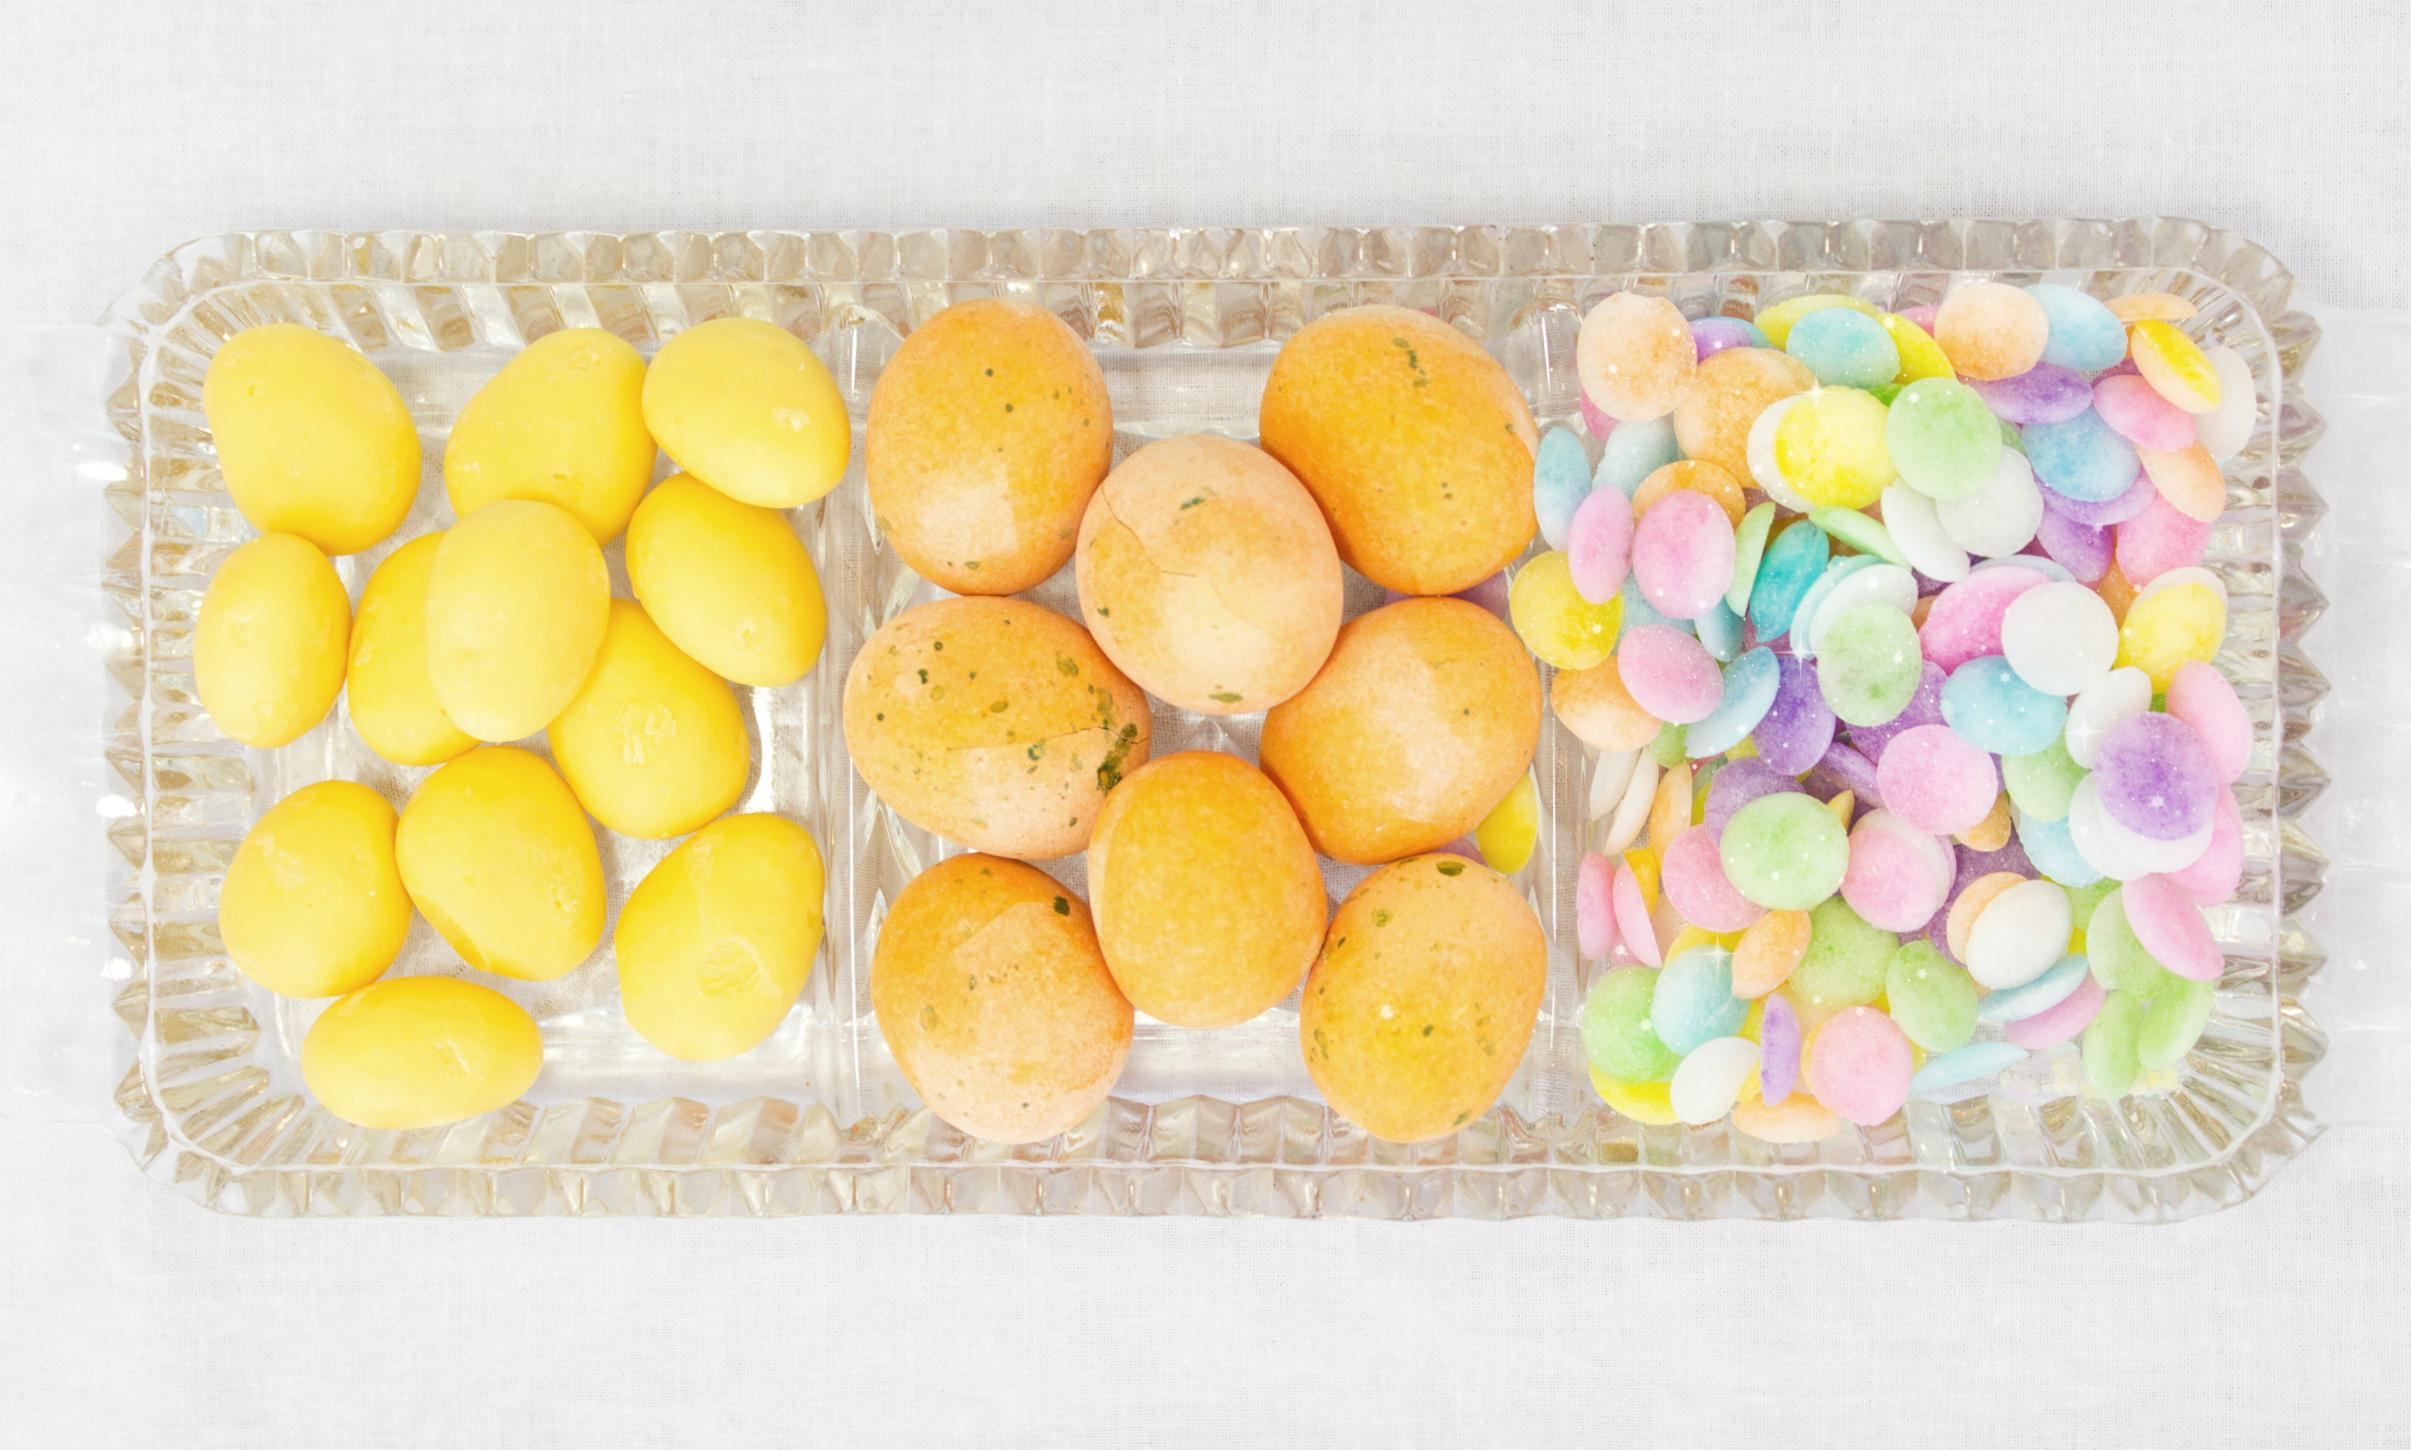 Sugarfina luxury candies and sweets